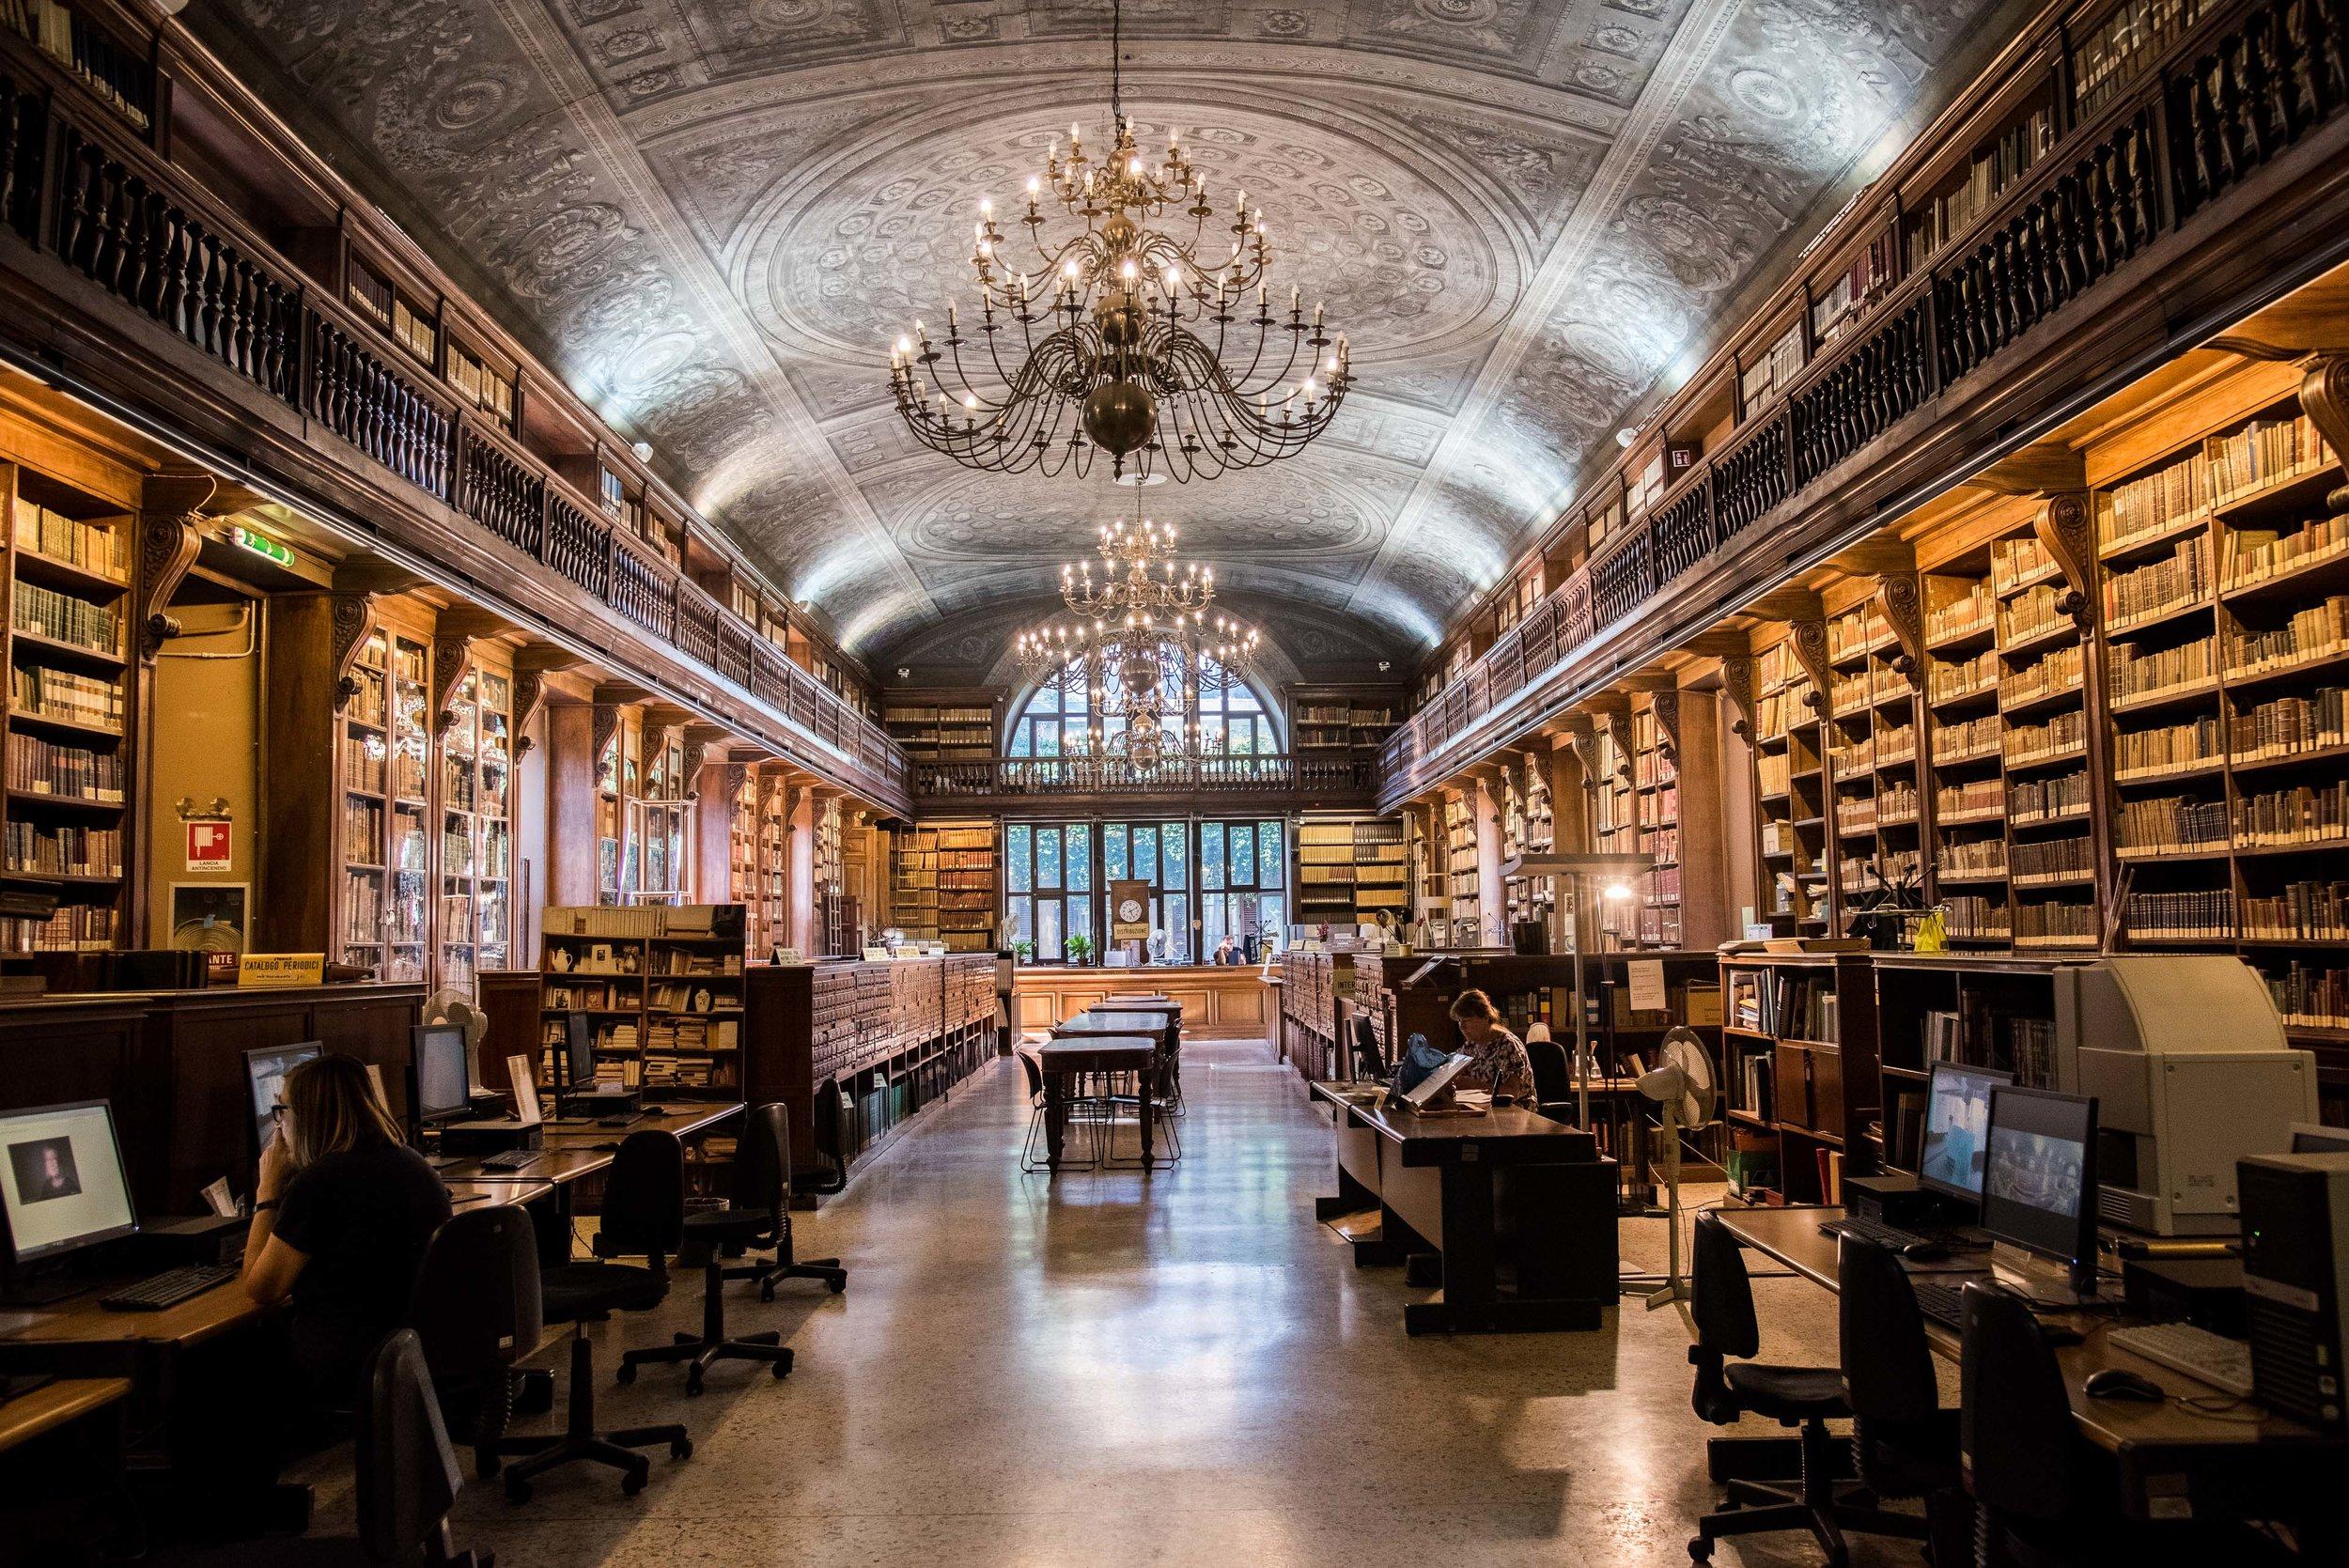 Biblioteca Nazionale Braidense. Milan, Italy 2017